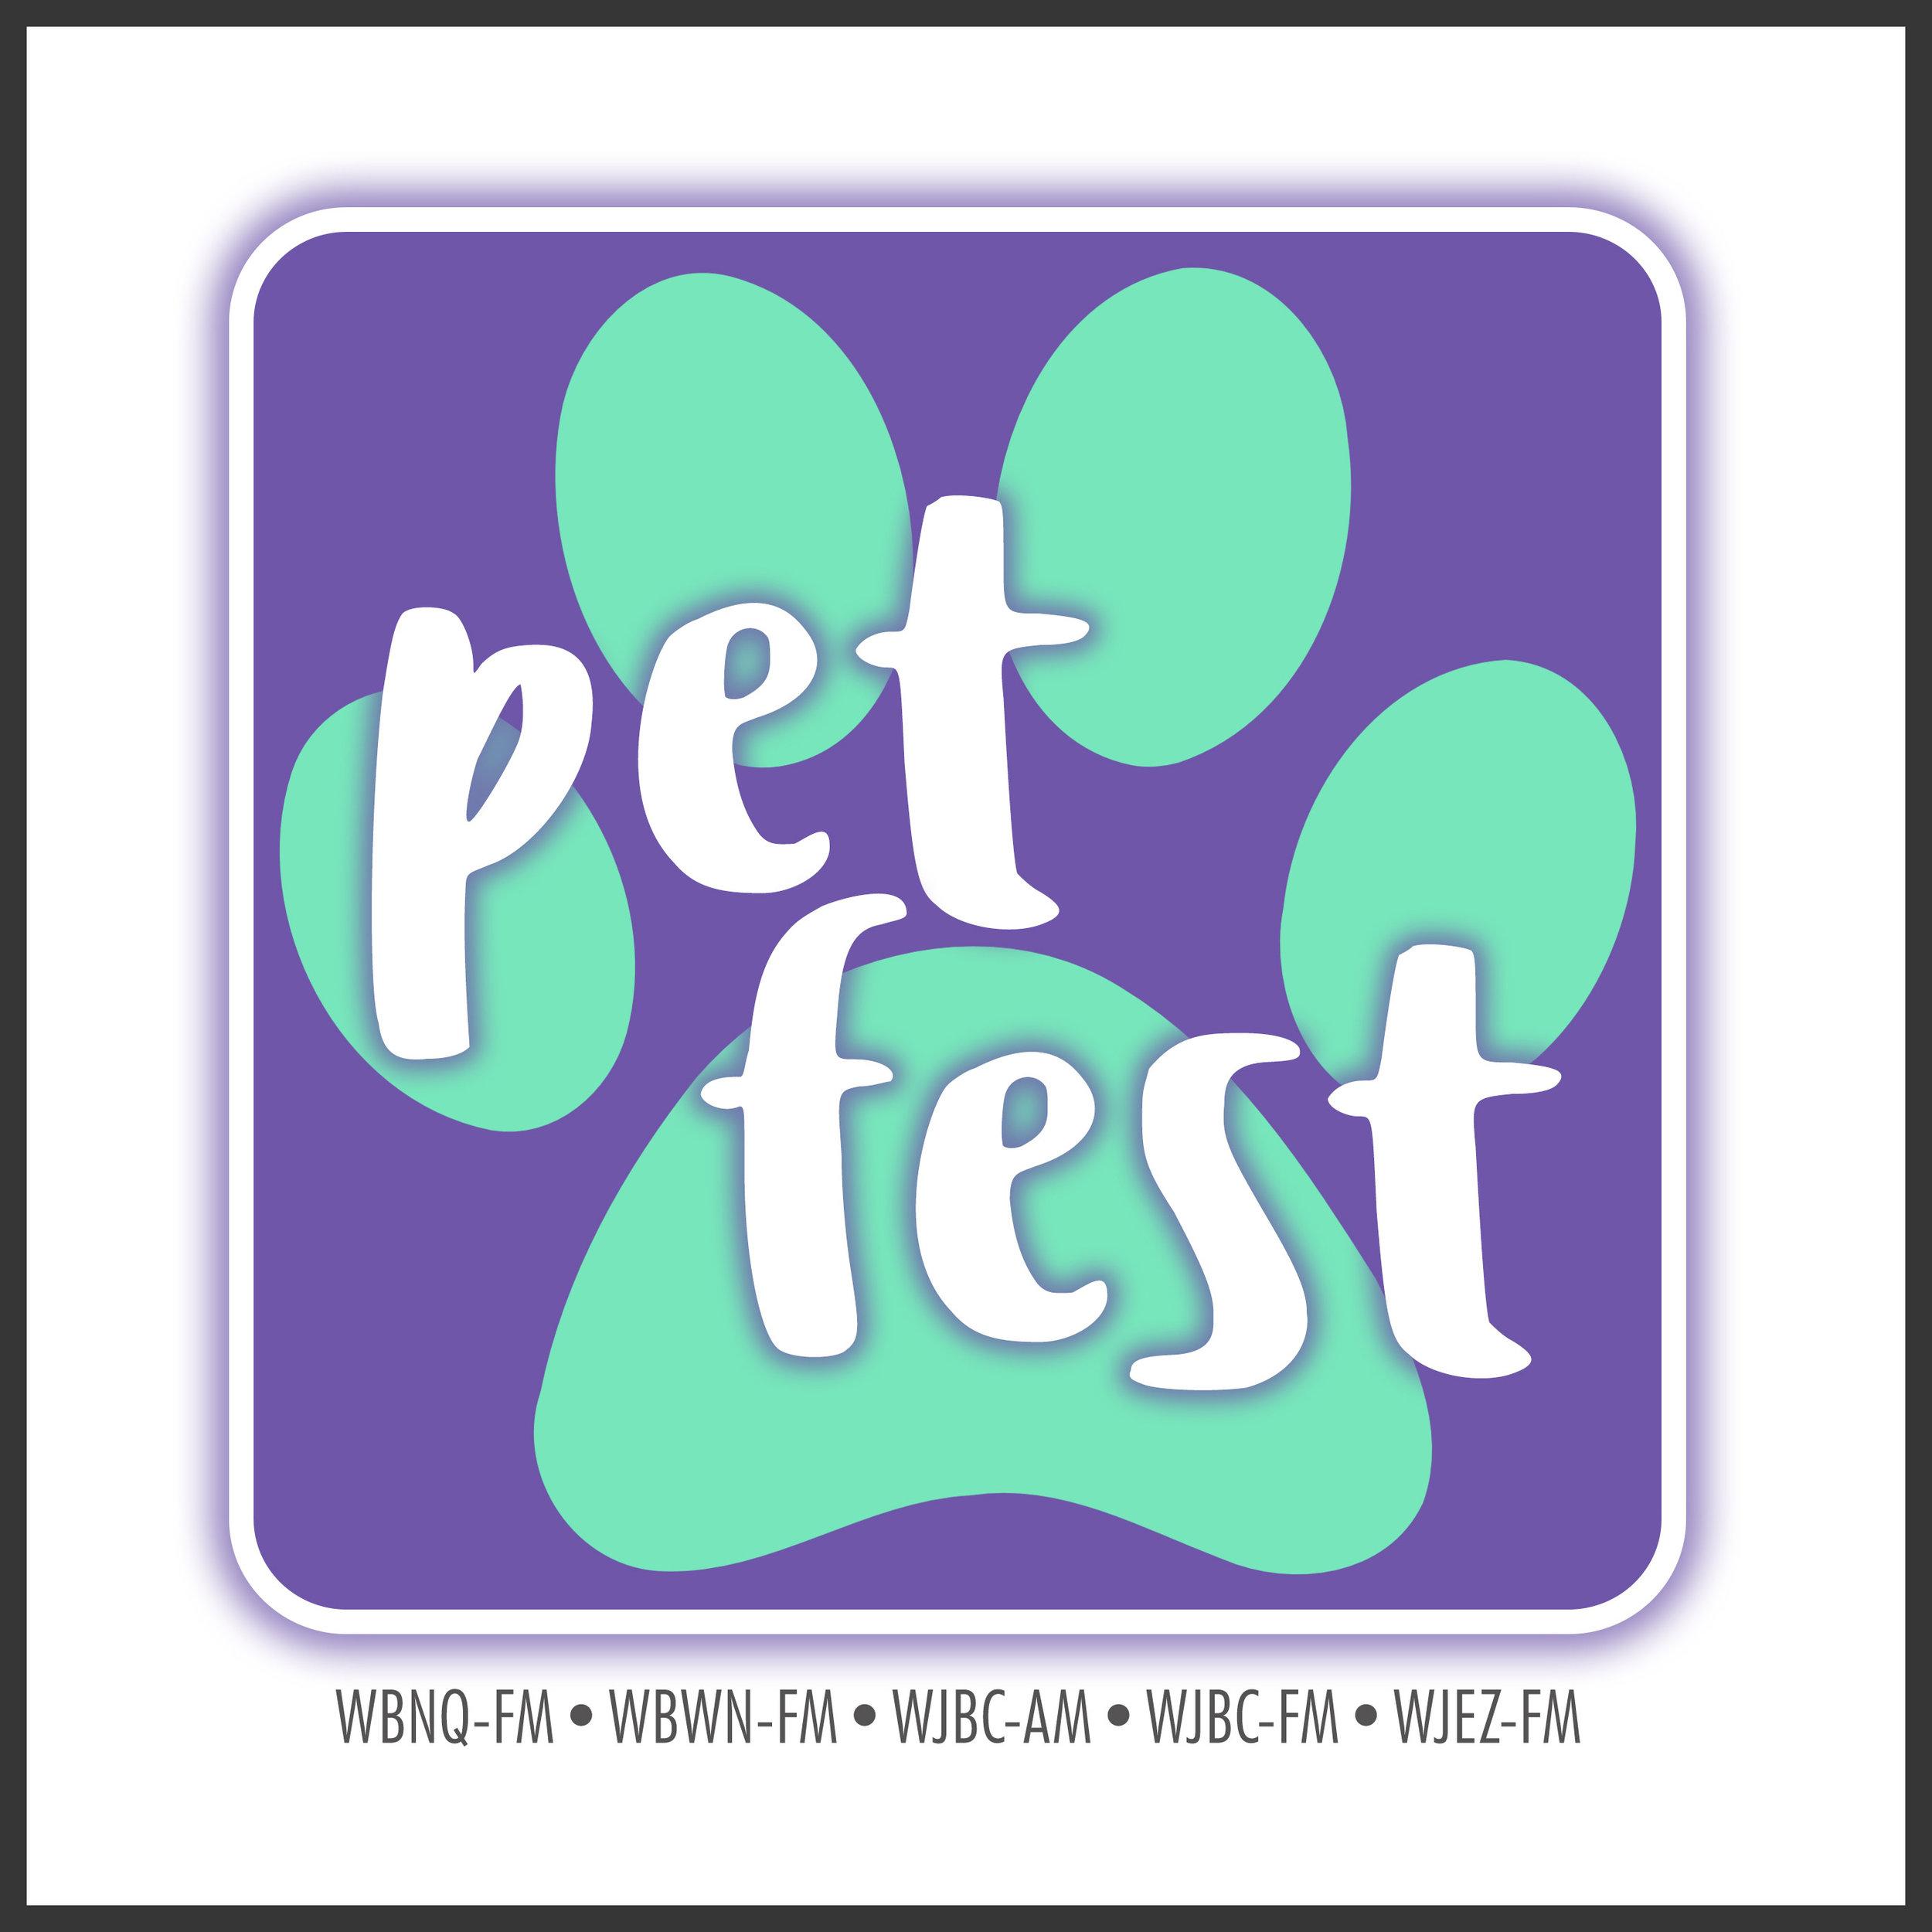 Cumulus Bloomington Pet Fest Logo 2018